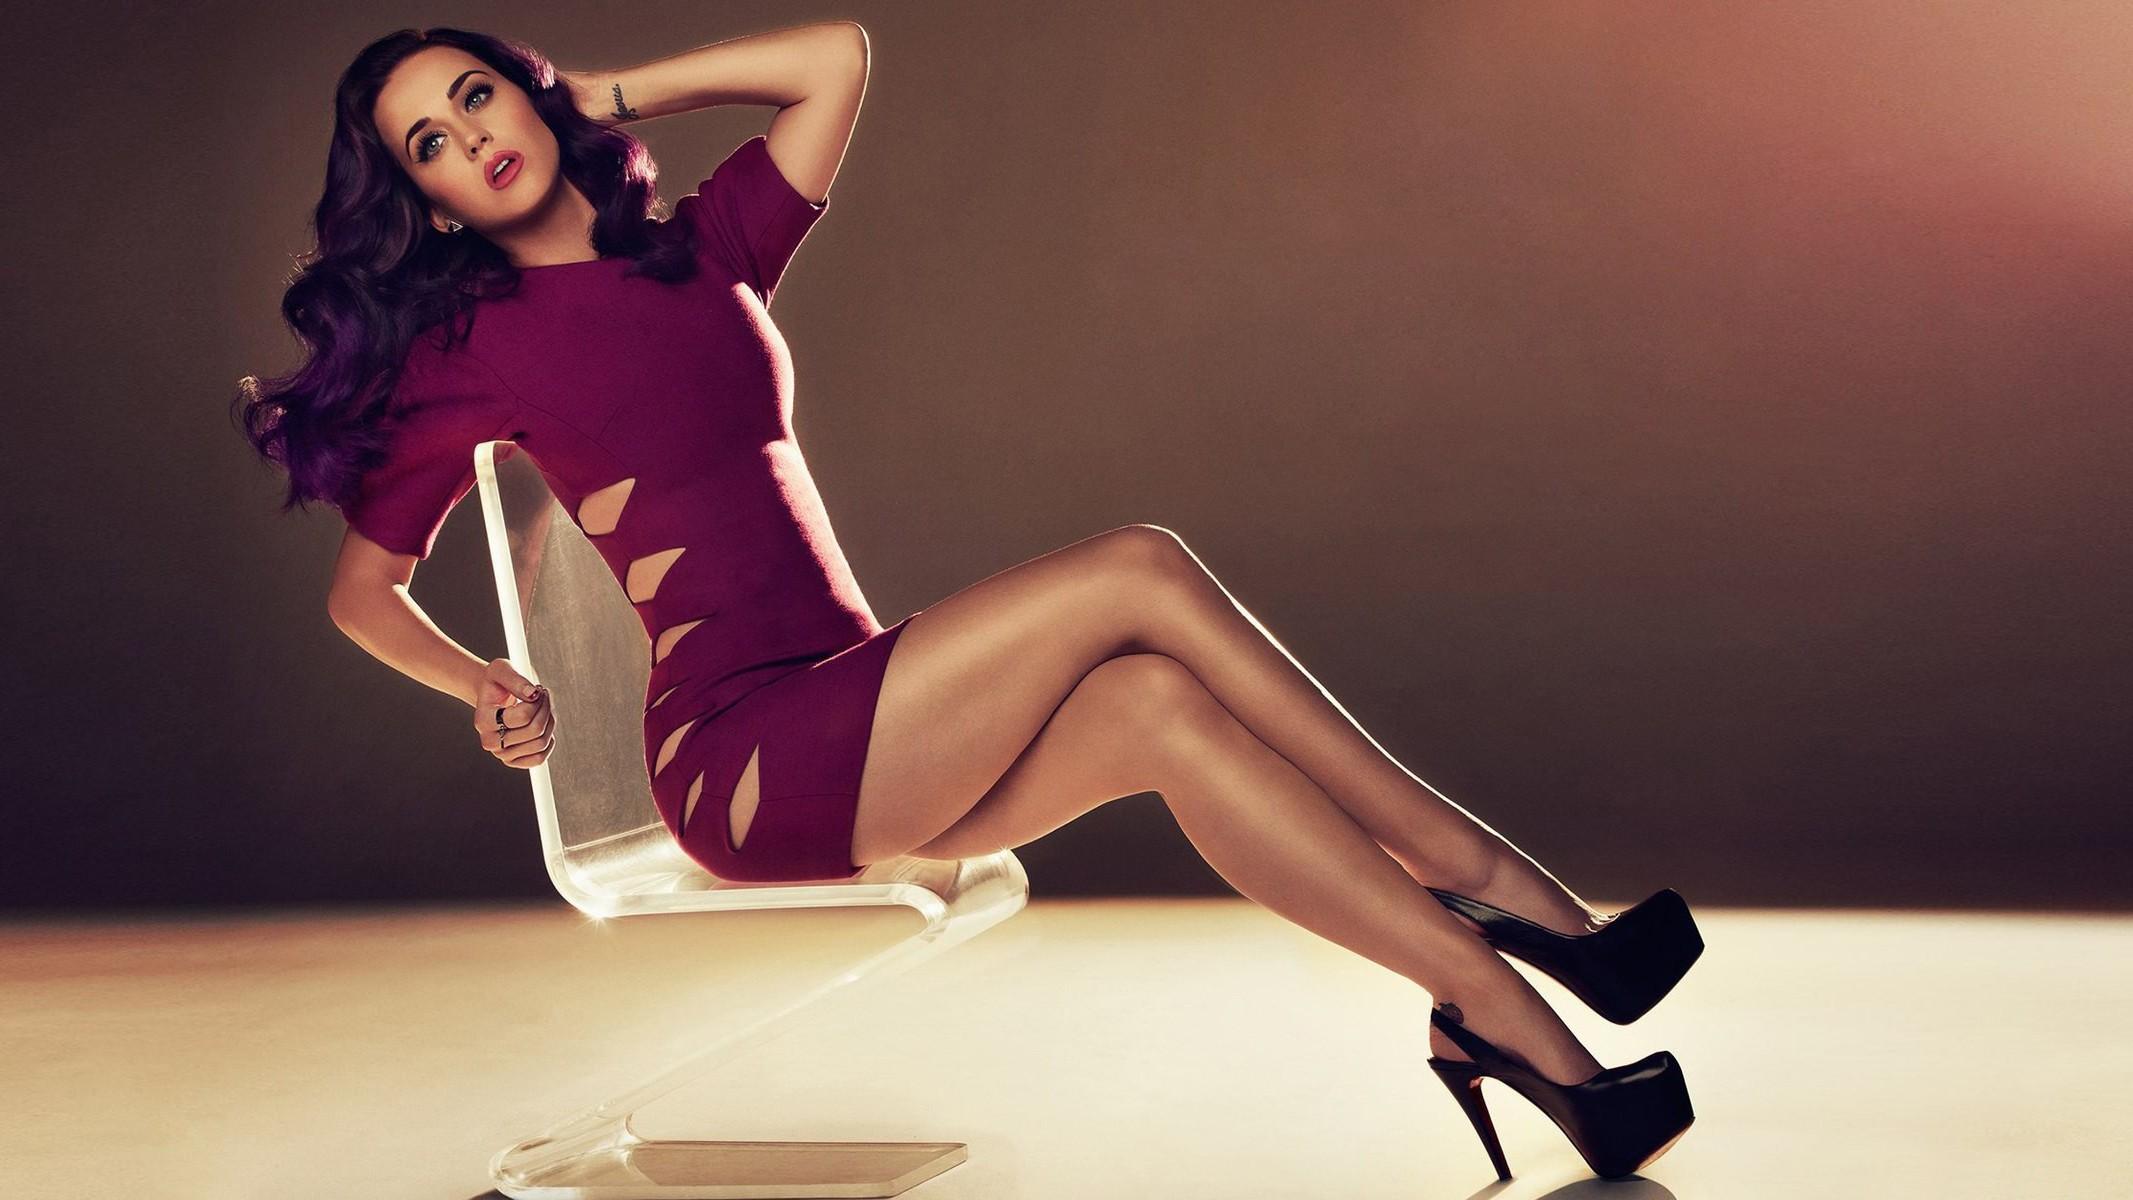 Kate Beckinsale: Her Allure Photo Shoot - Allure